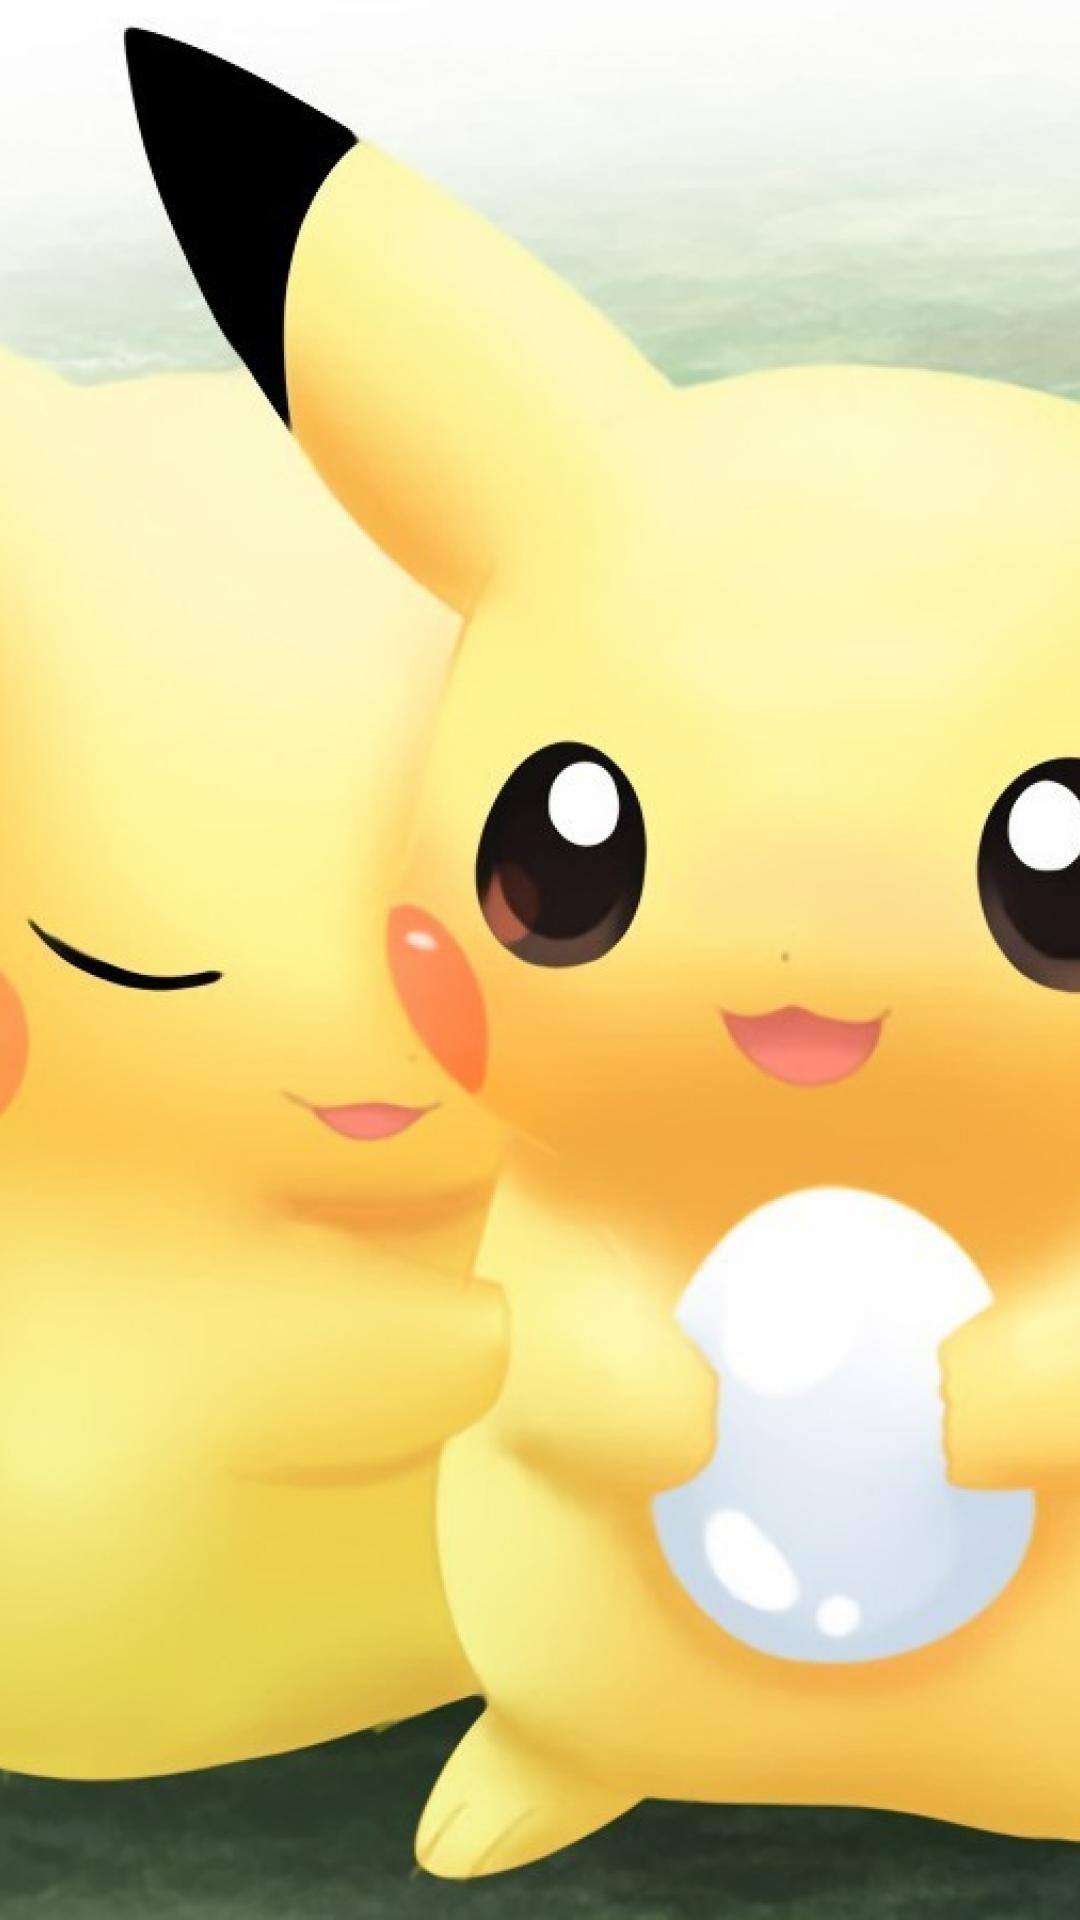 Pokemon Pikachu love girly love iphone 6 plus wallpaper.